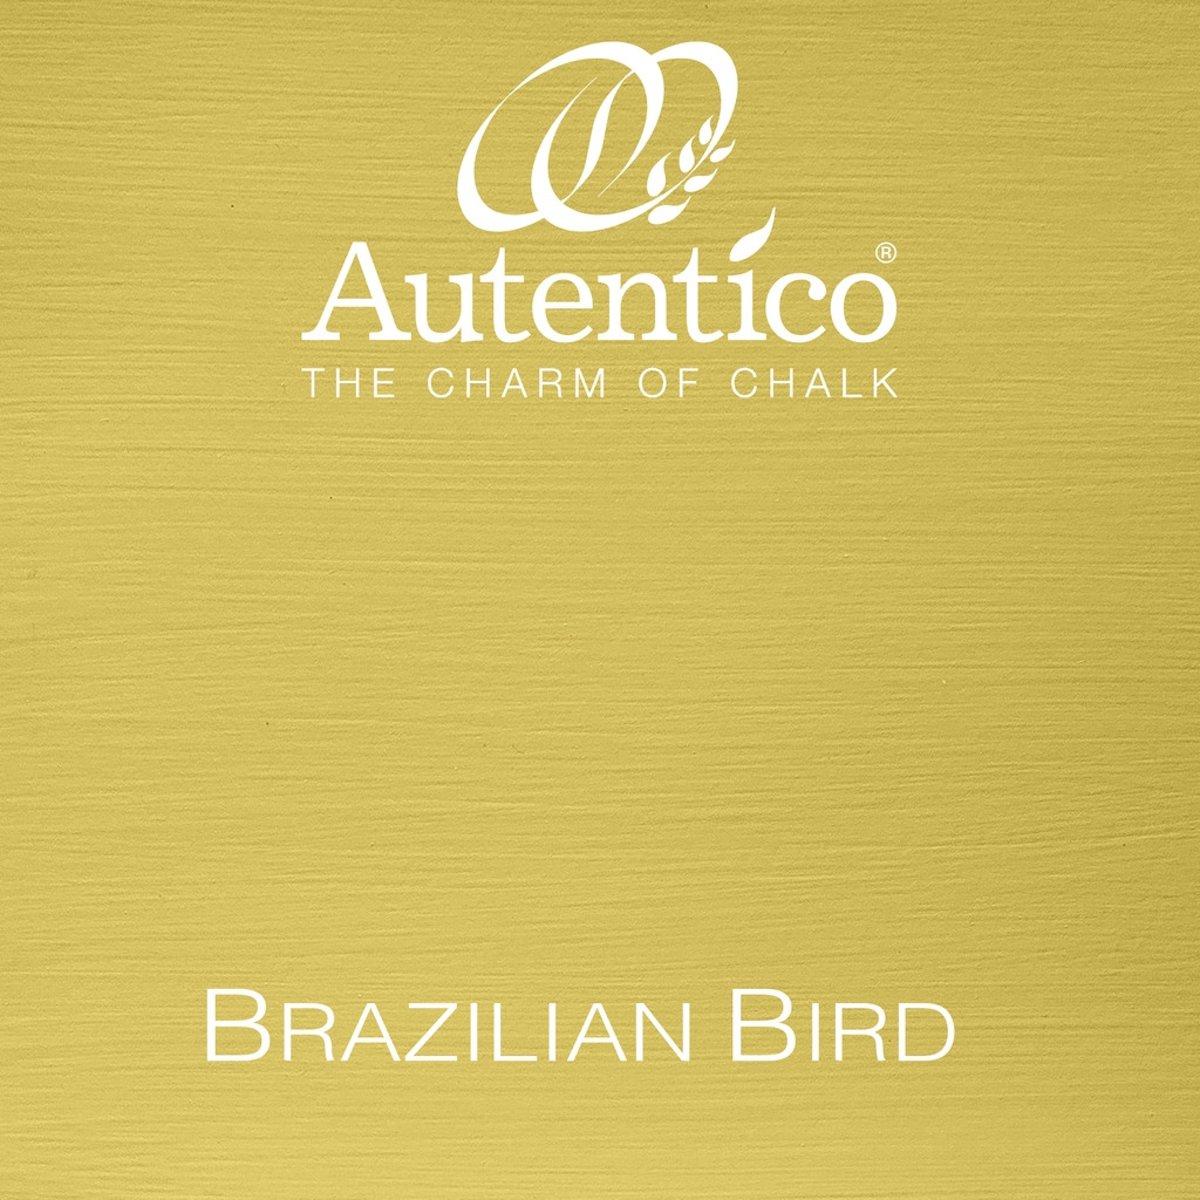 Autentico Velvet 2.5 L   Brazilian Bird kopen